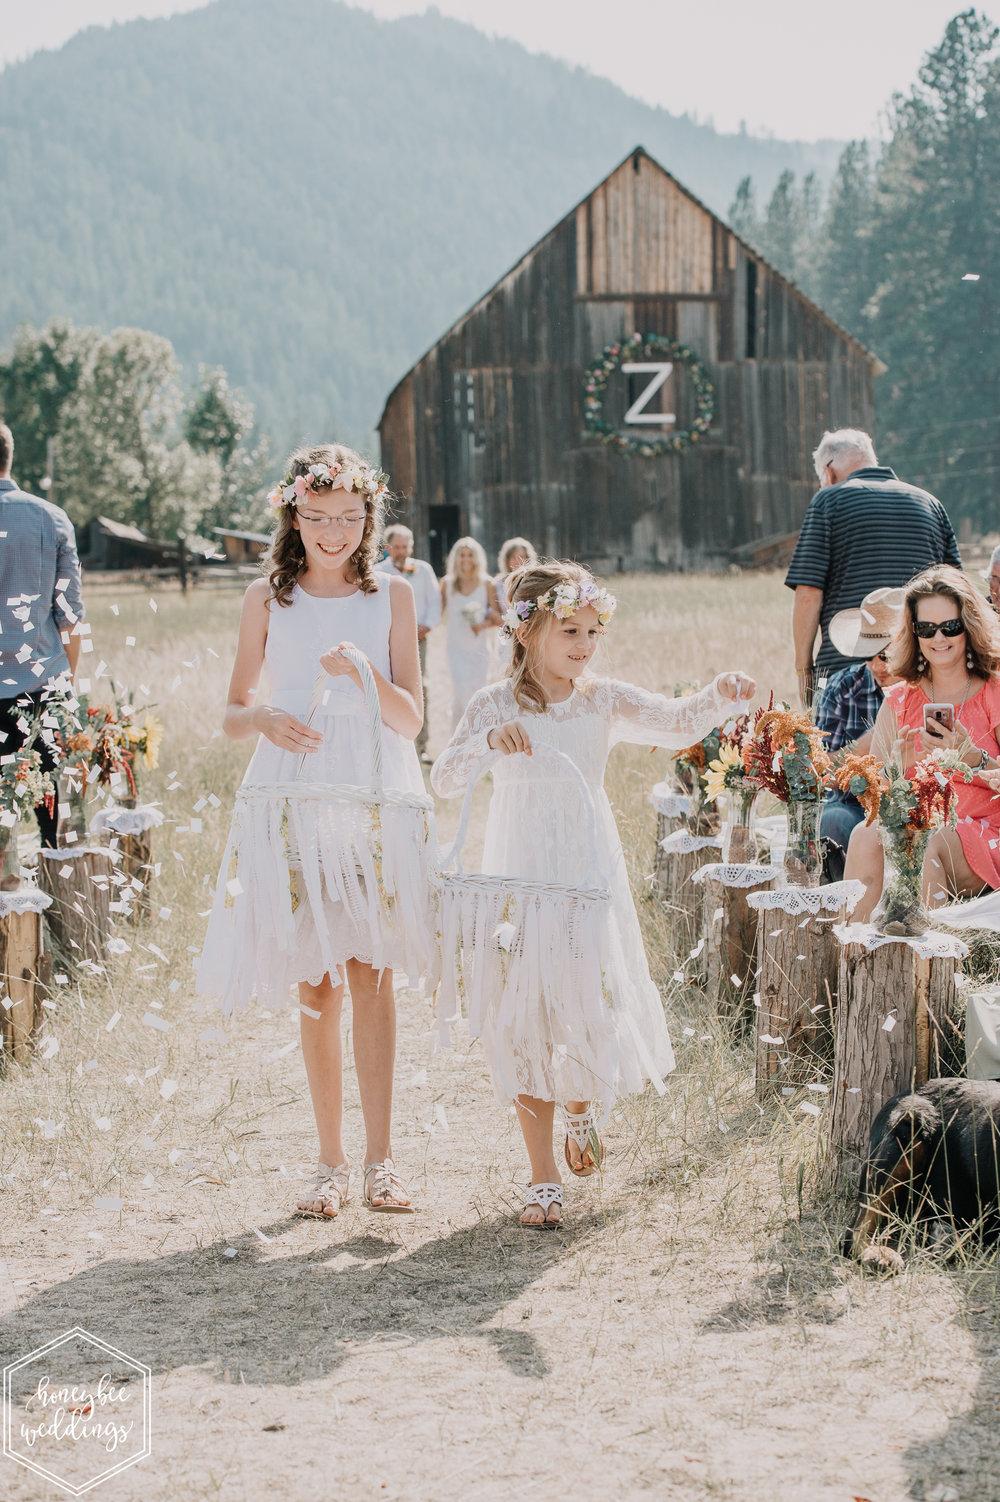 0342Alberton Wedding_Montana Wedding Photographer_Anneliesa Bashaw + Wyatt Zeylawy_August 11, 2018-198.jpg